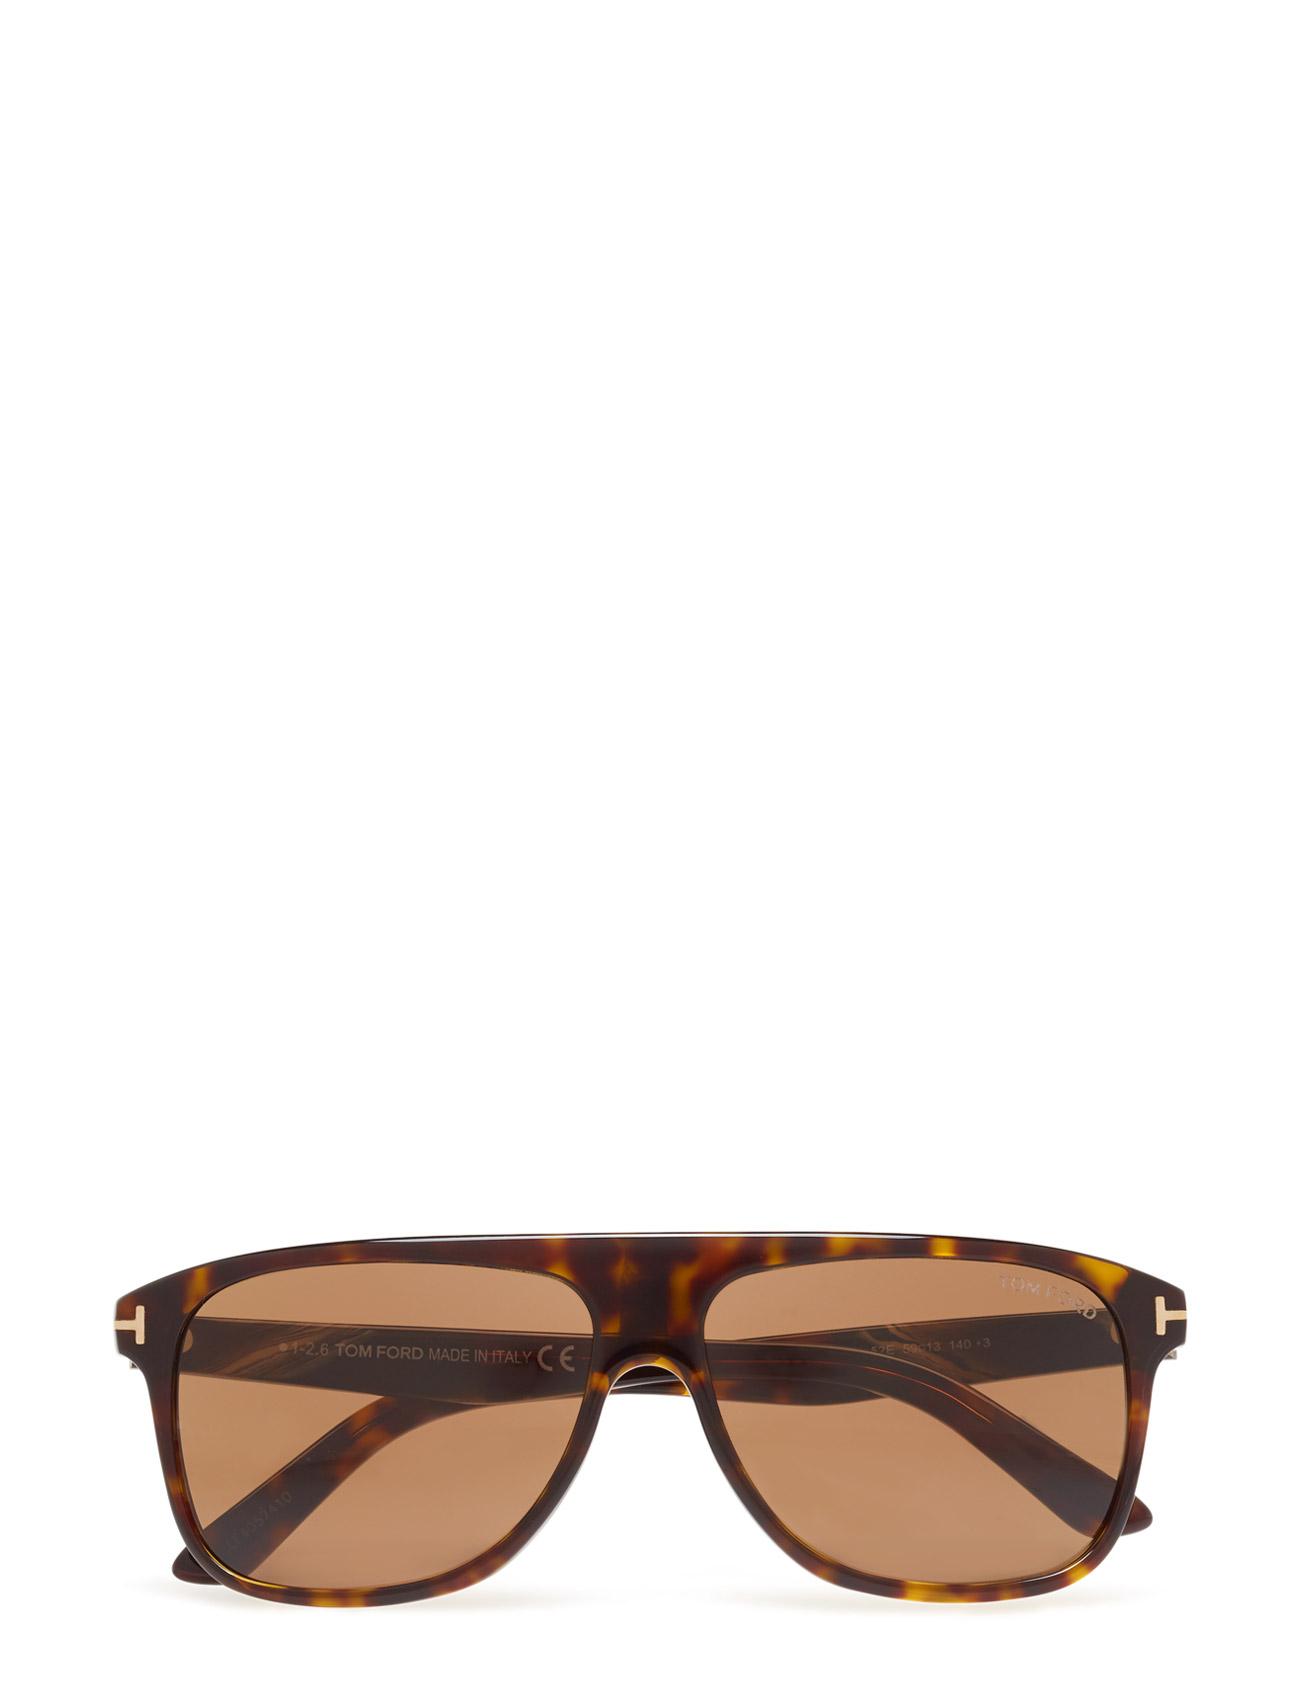 Tom Ford Inigo Tom Ford Sunglasses Solbriller til Herrer i